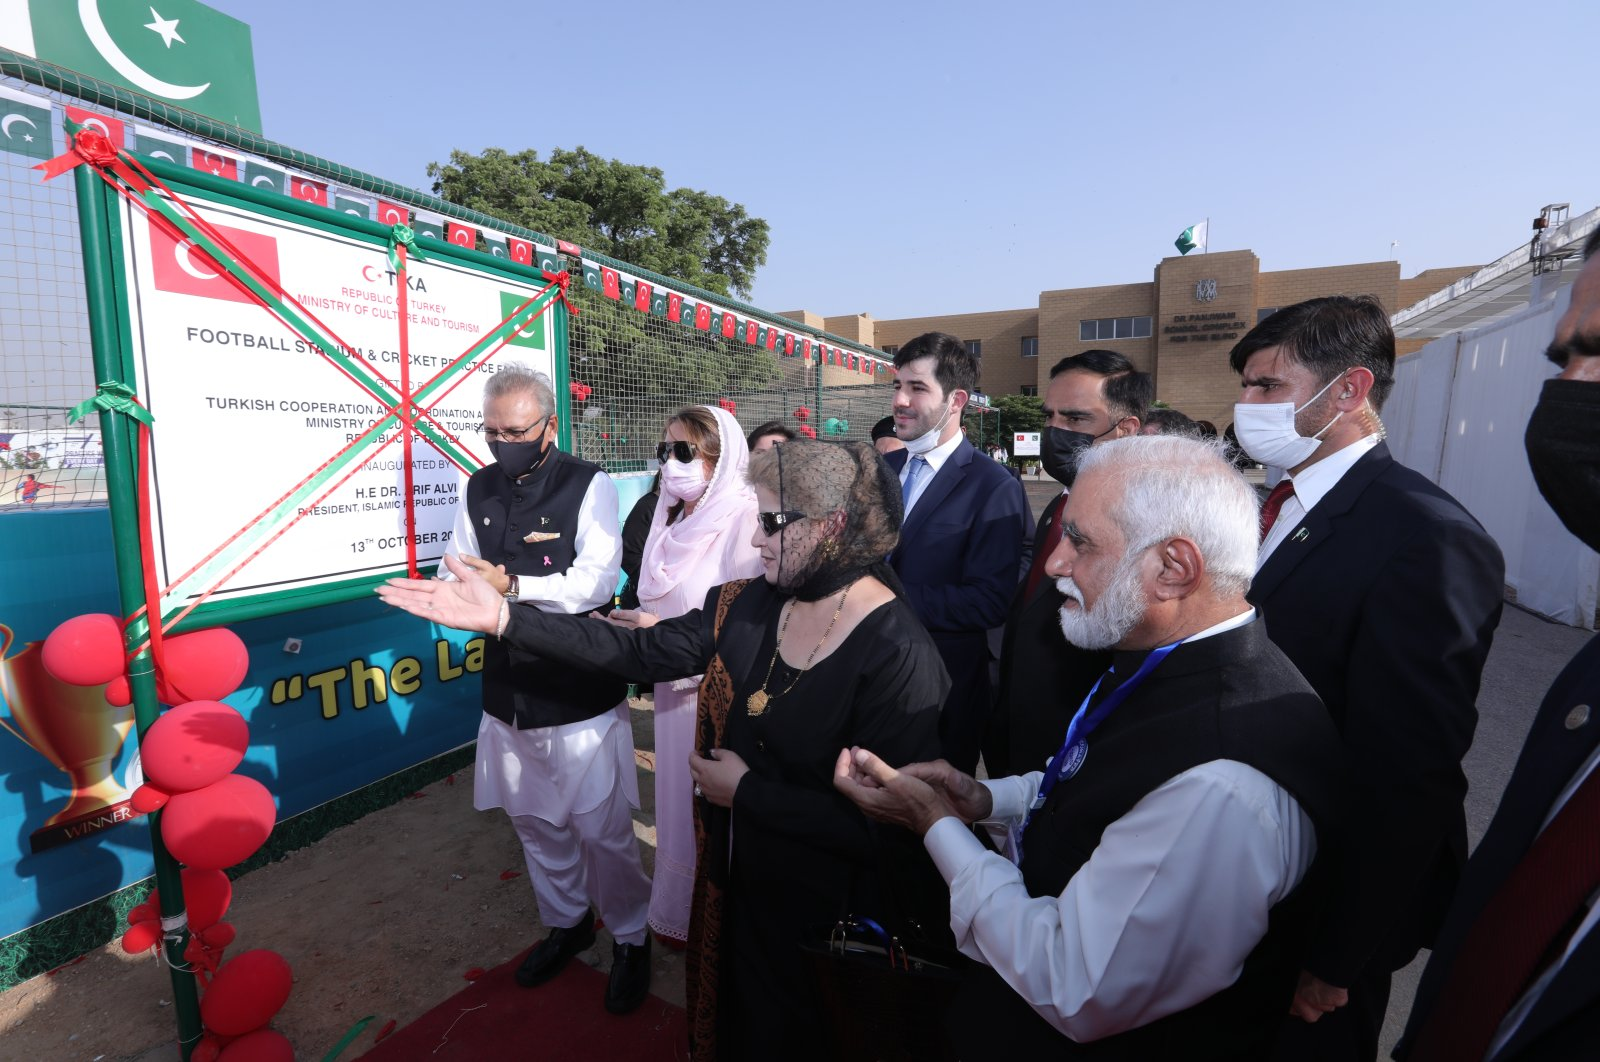 The inaguration ceremony of TIKA's cricket and football training facilities for children in Karachi, Oct.13, 2021. (AA Photo)